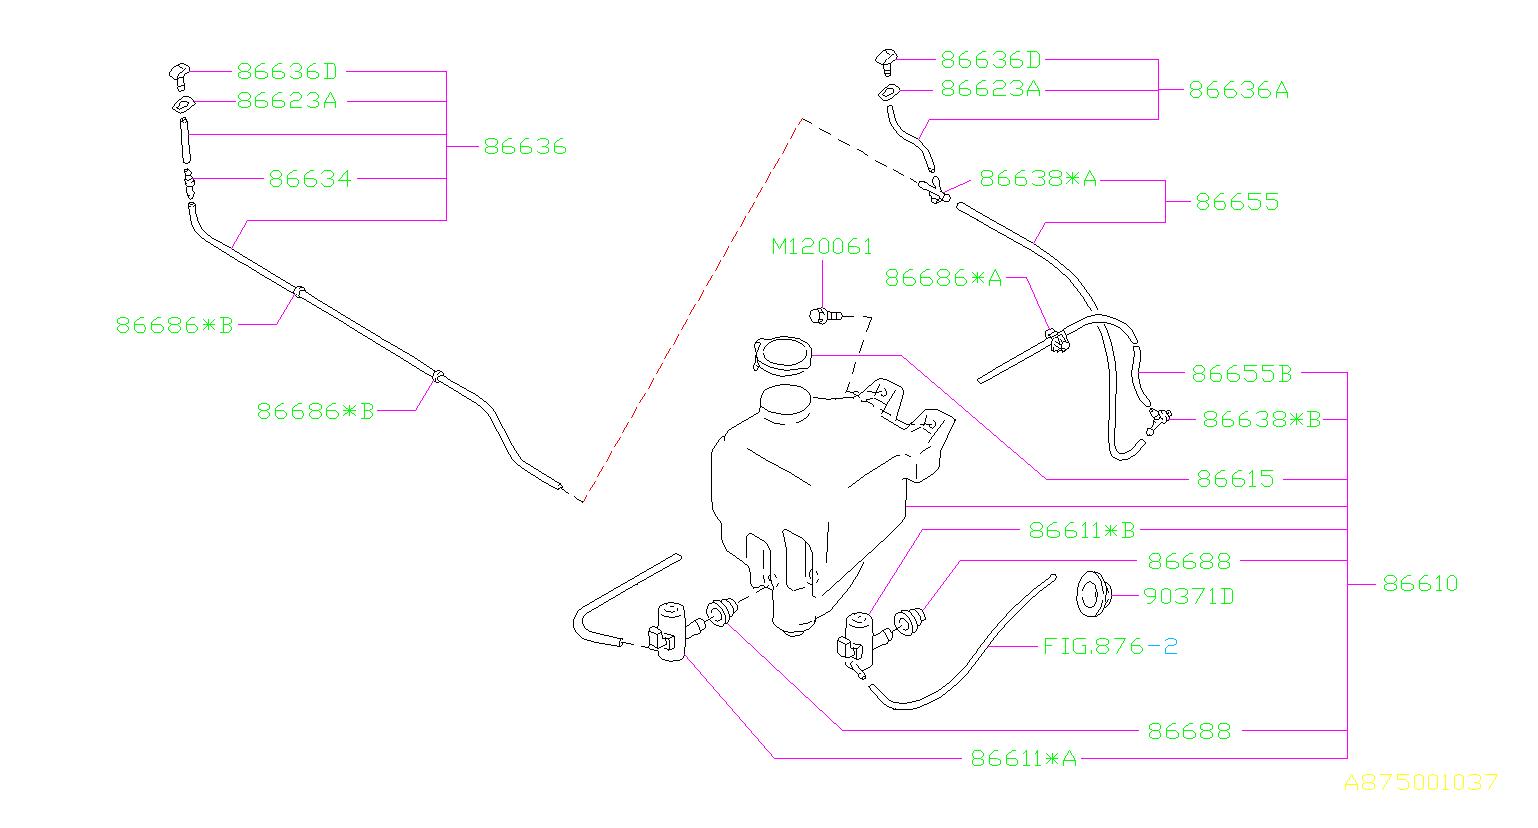 [DIAGRAM] Wiring Diagram Subaru Impreza 1998 Espa Ol FULL ...